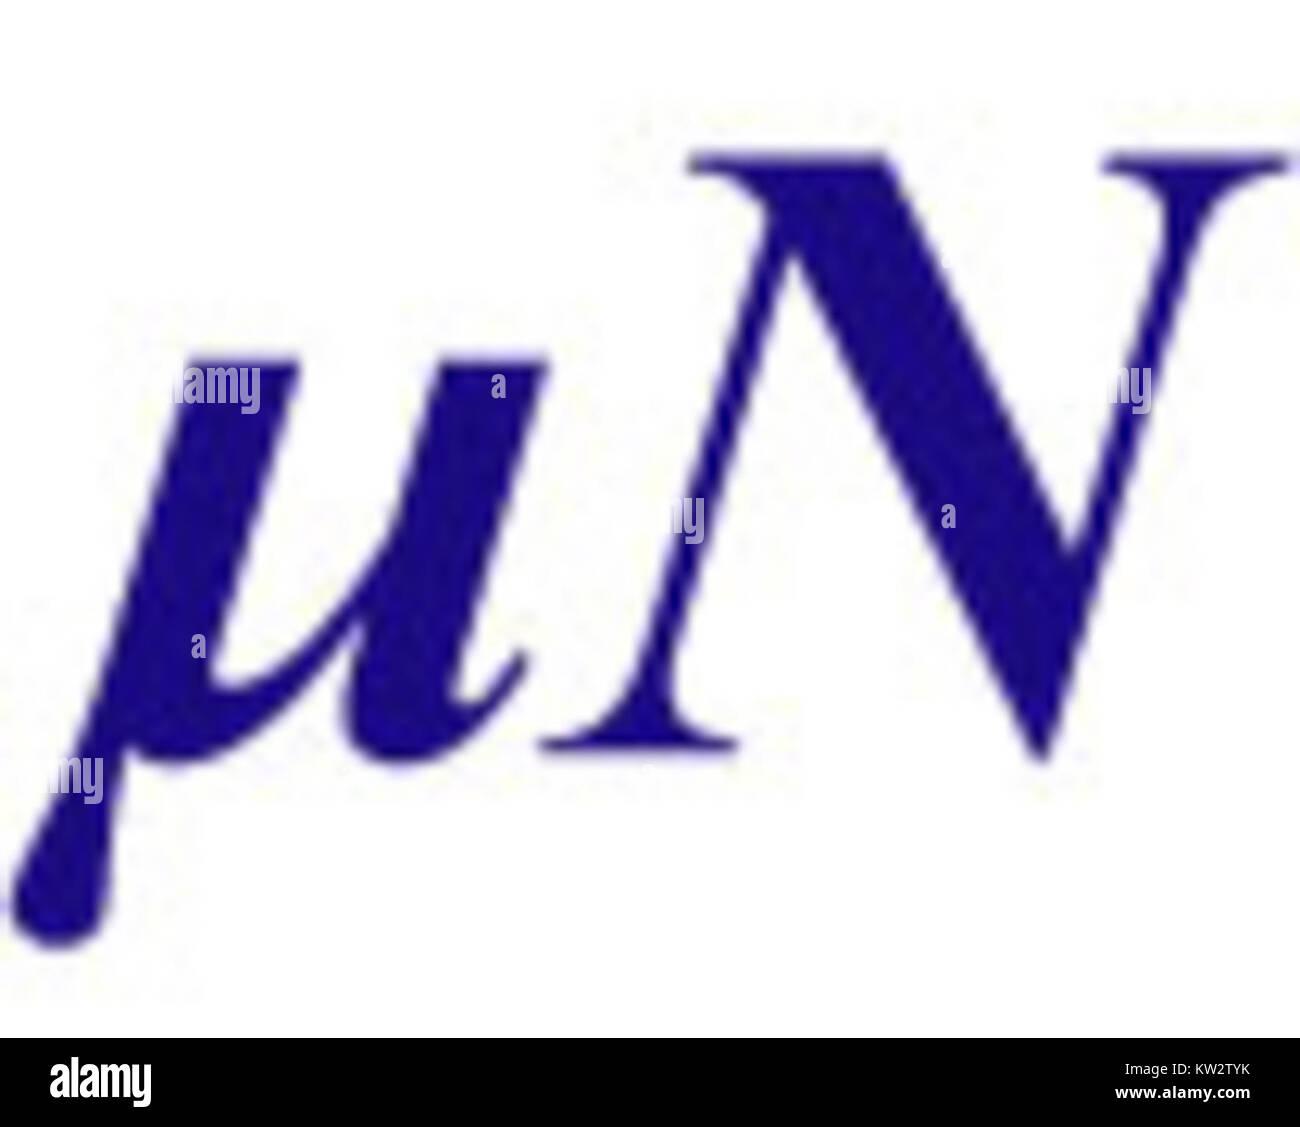 Micronation logo - Stock Image